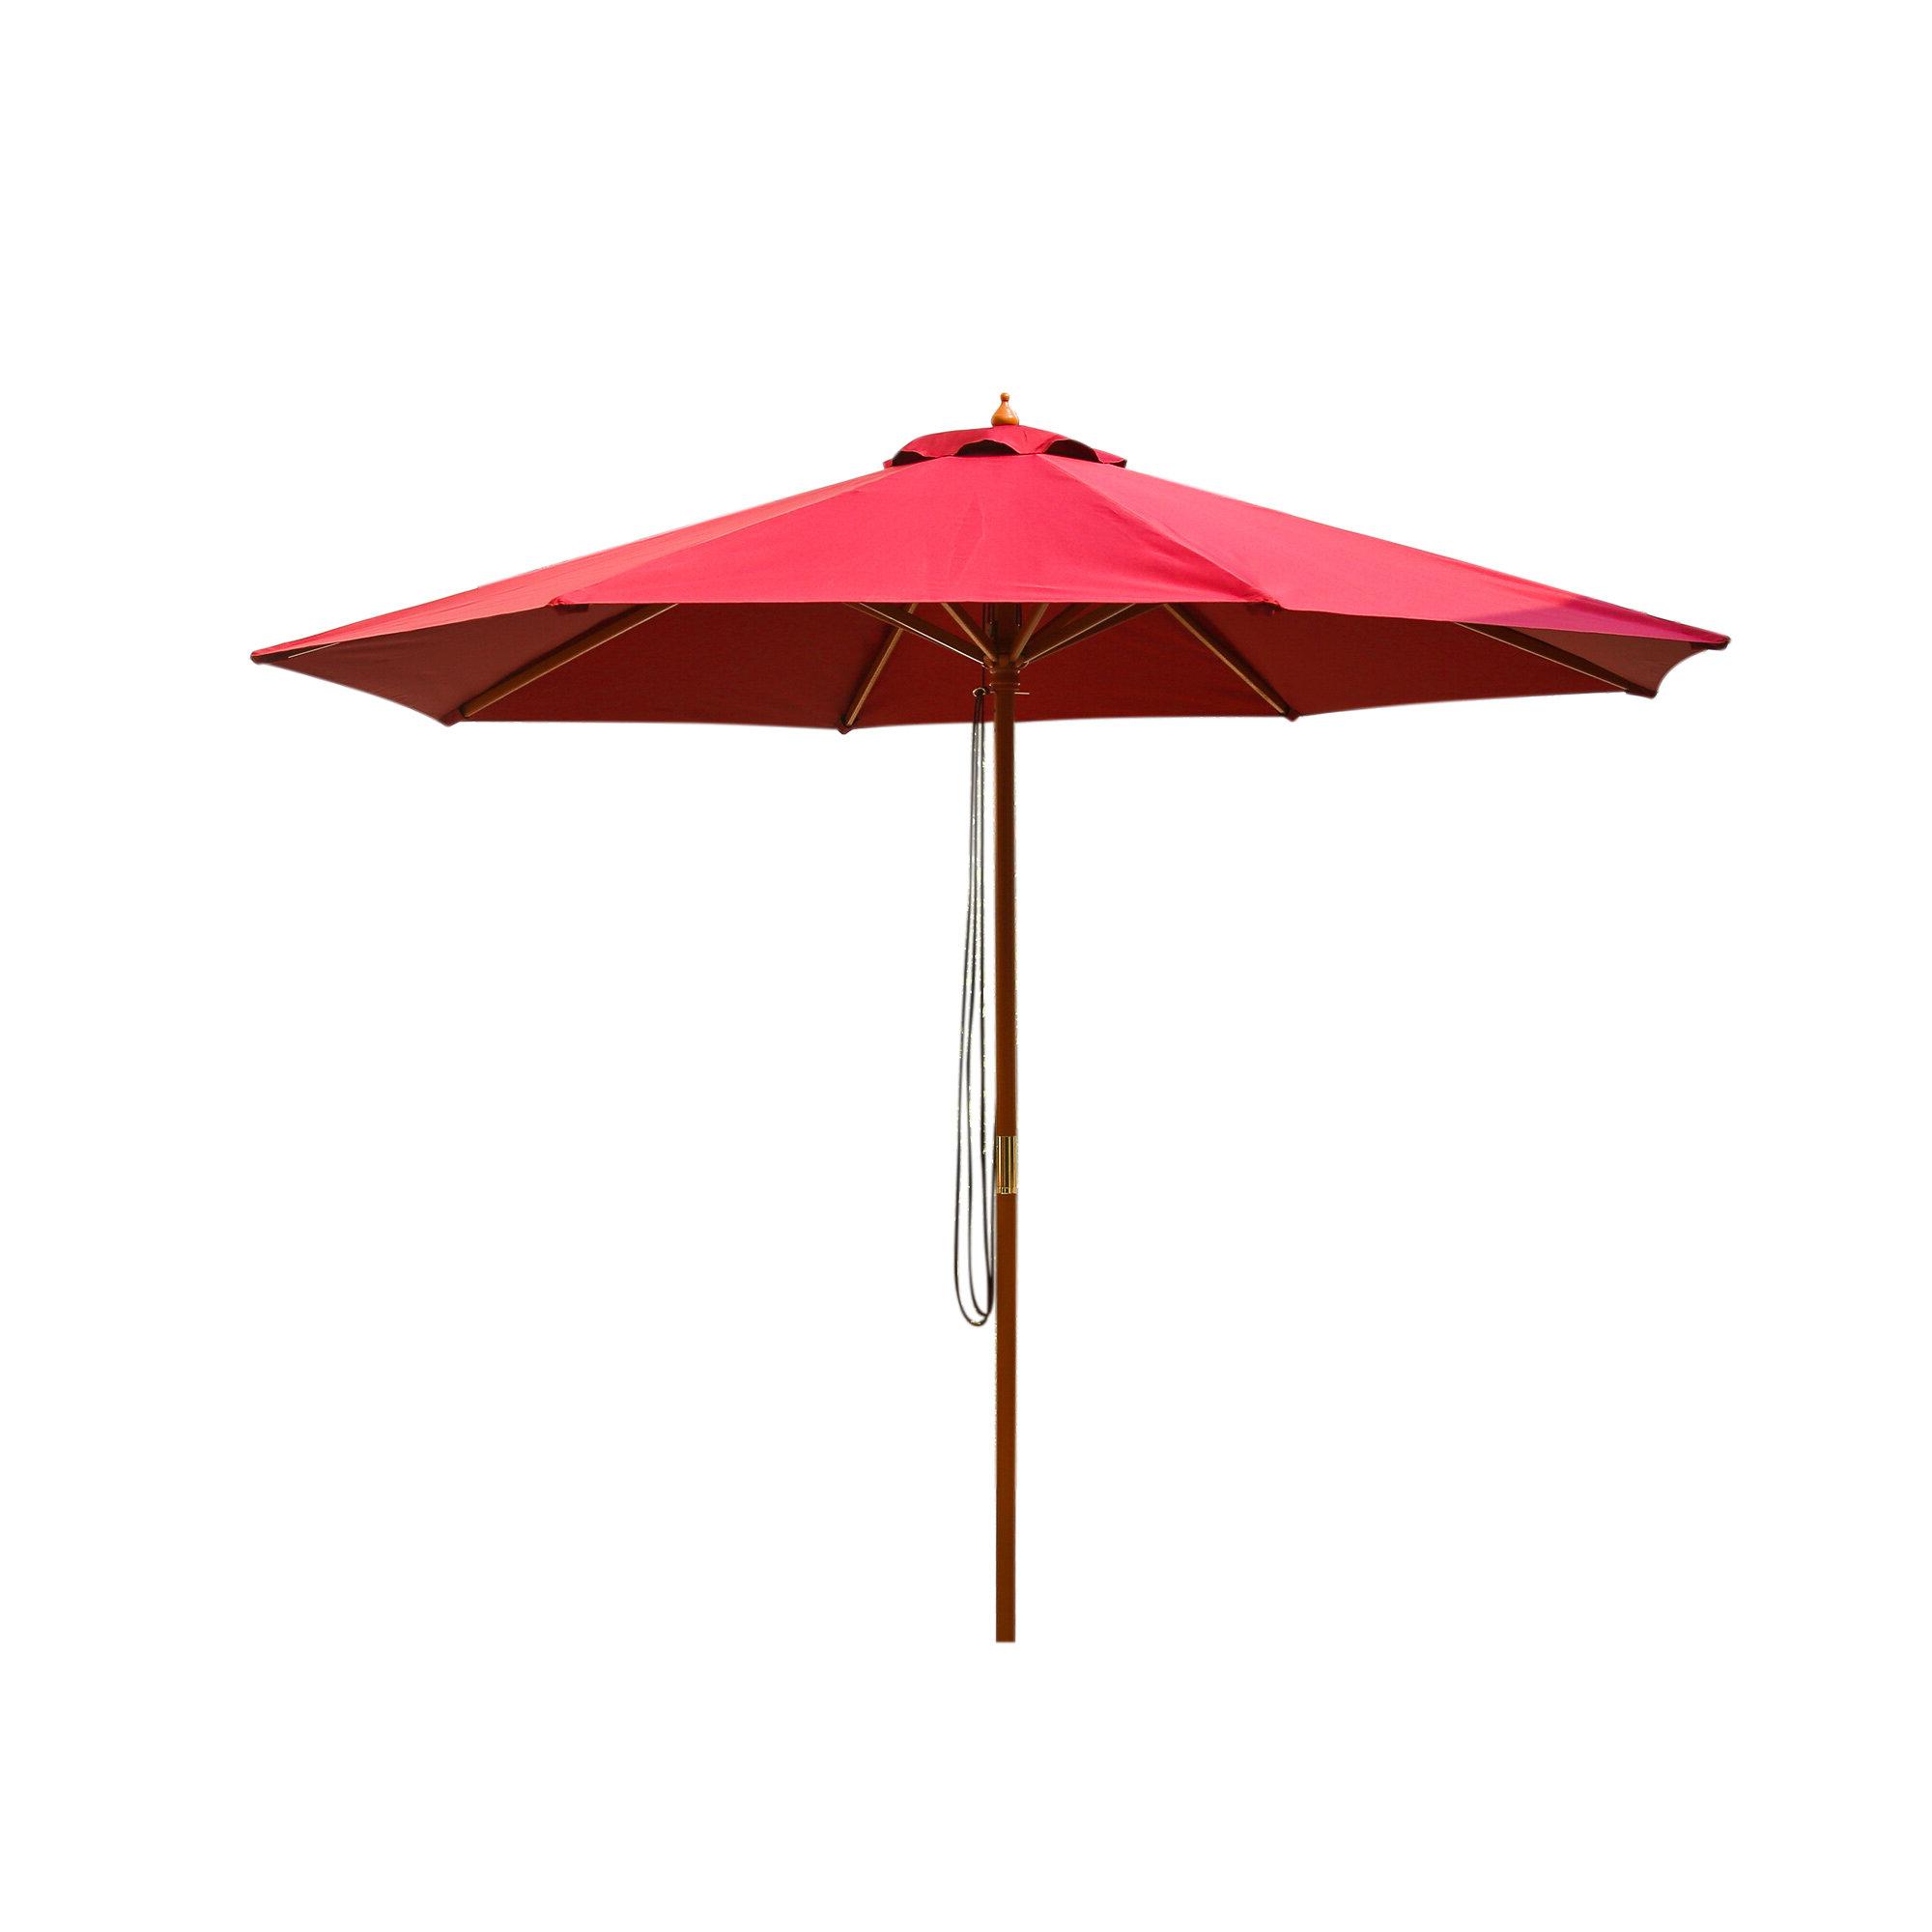 Haslingden 9' Market Umbrella Throughout Trendy Aldan Market Umbrellas (View 10 of 20)